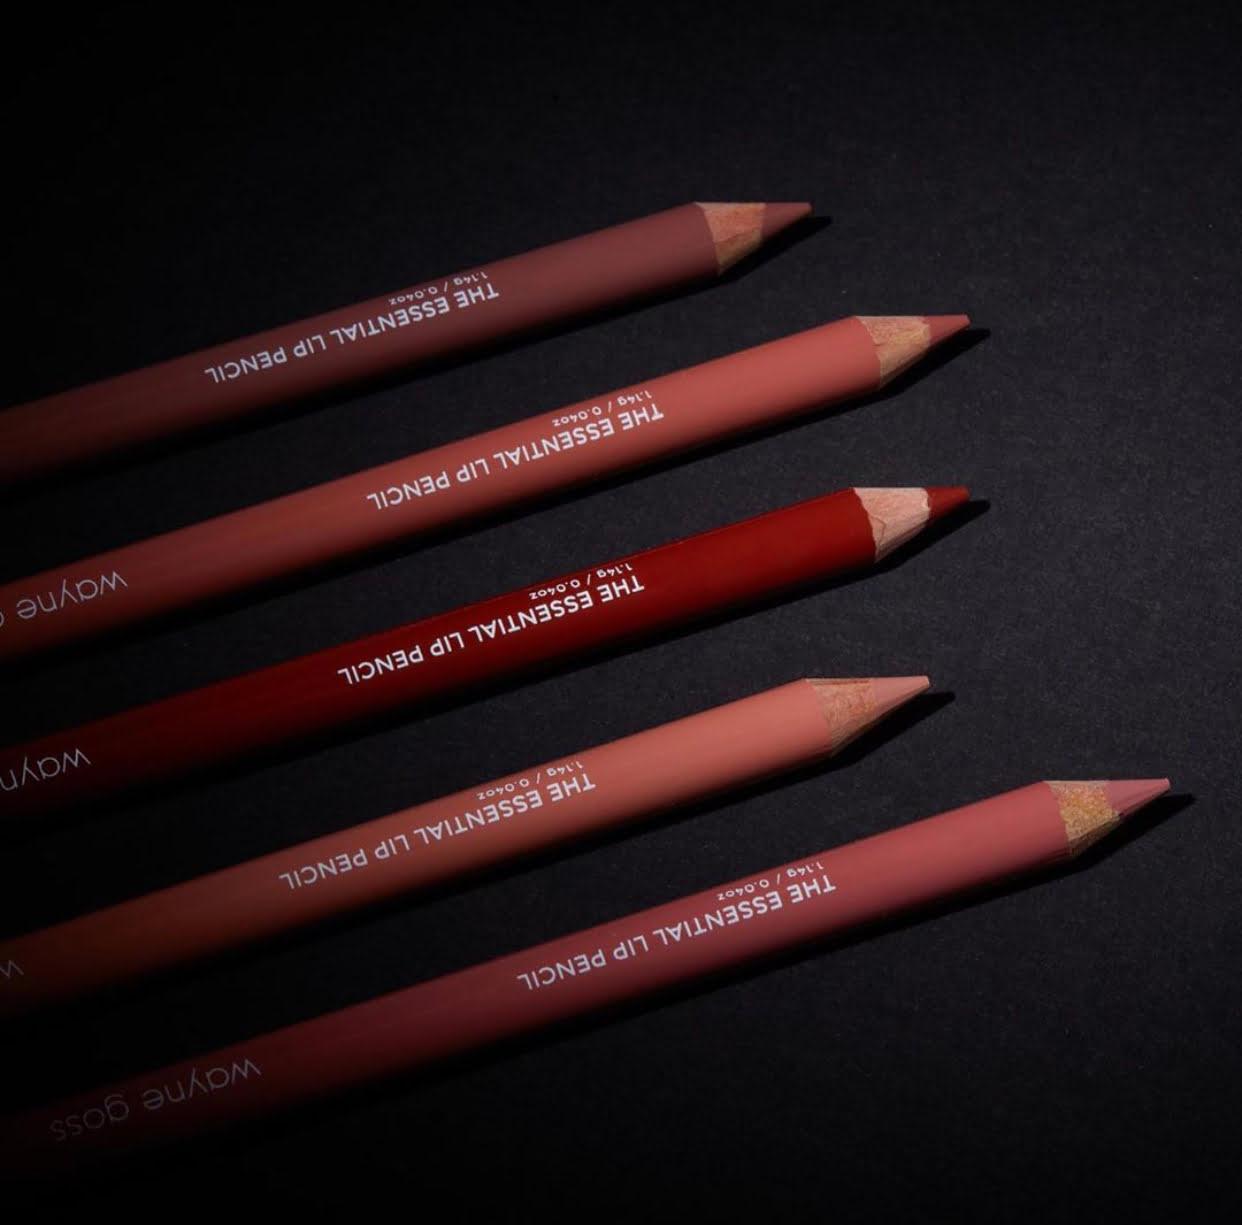 Wayne Goss Cosmetics The Lip Collection